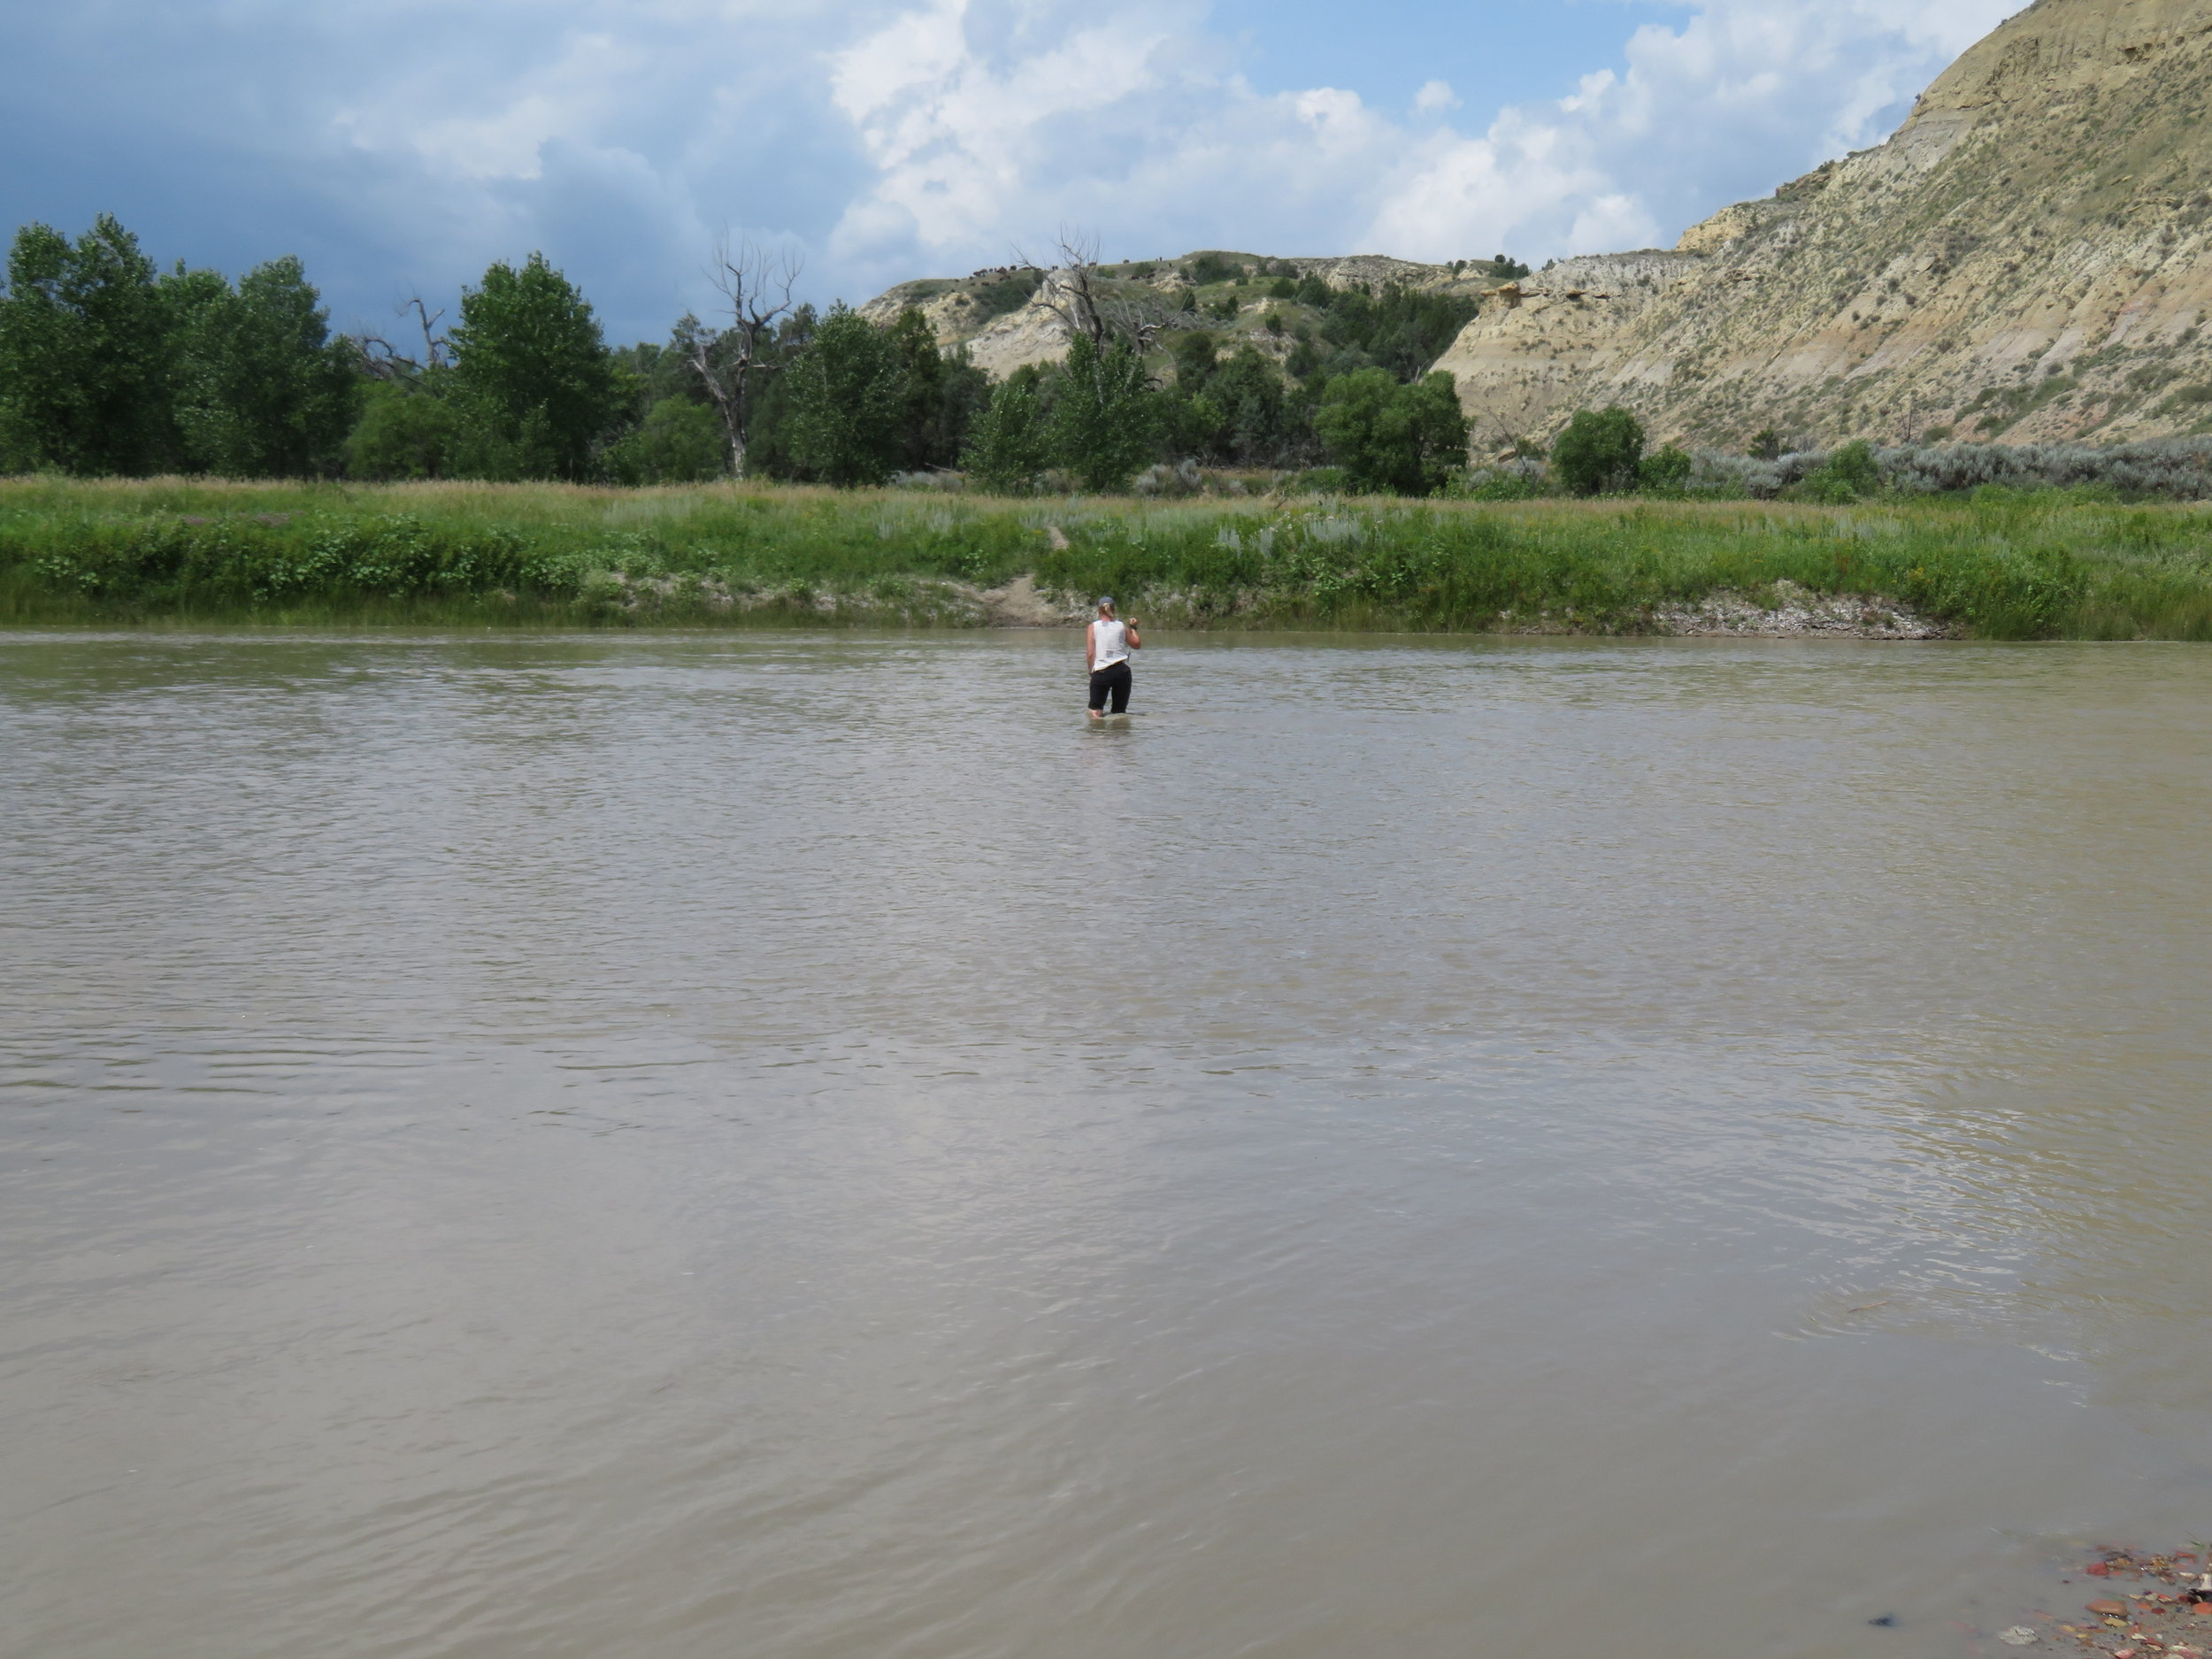 Fording the Little Missouri River